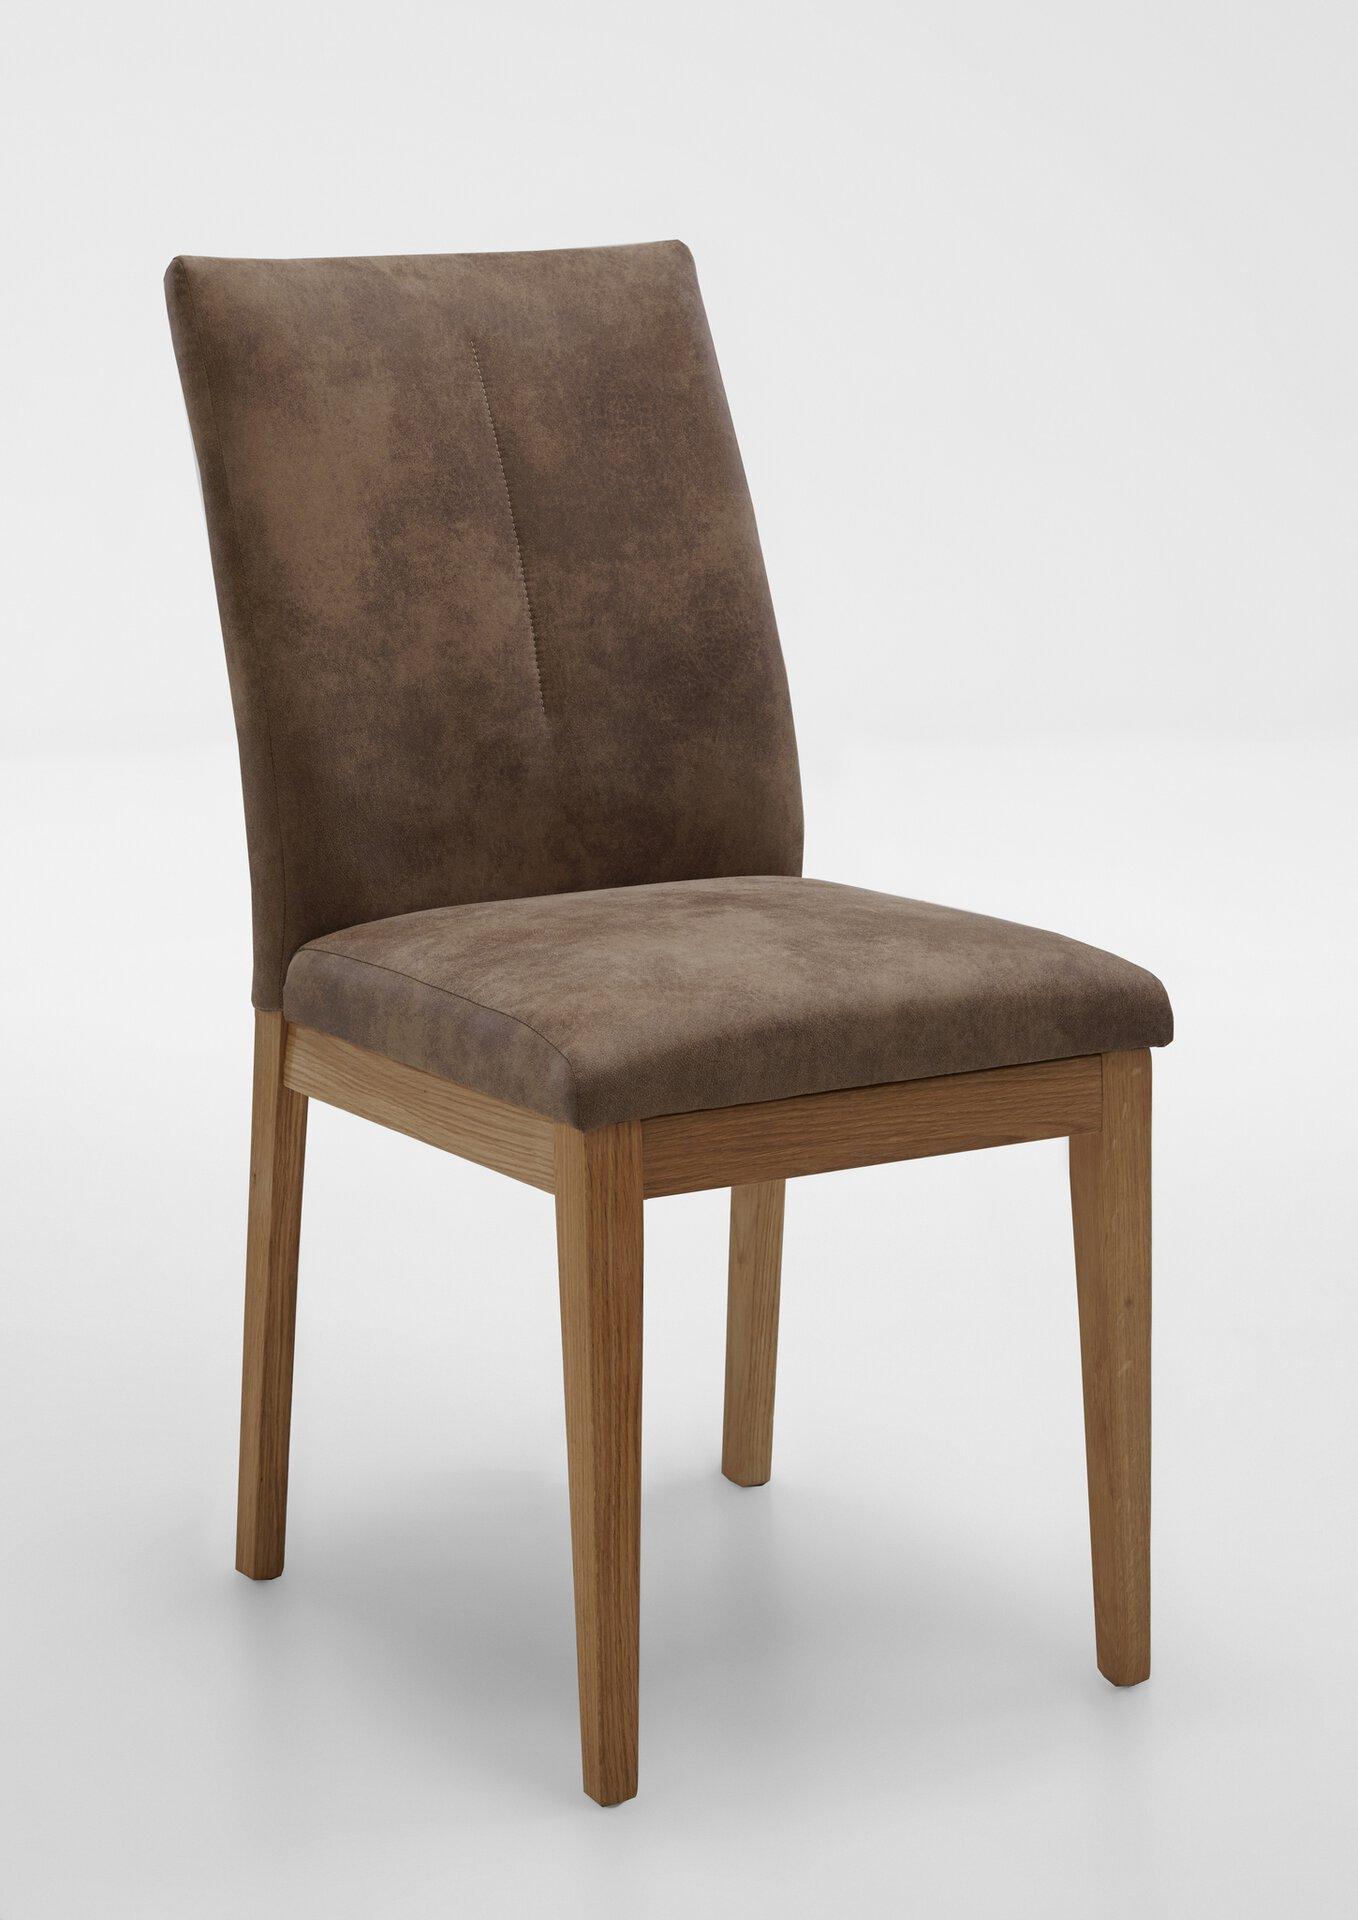 4-Fuß-Stuhl